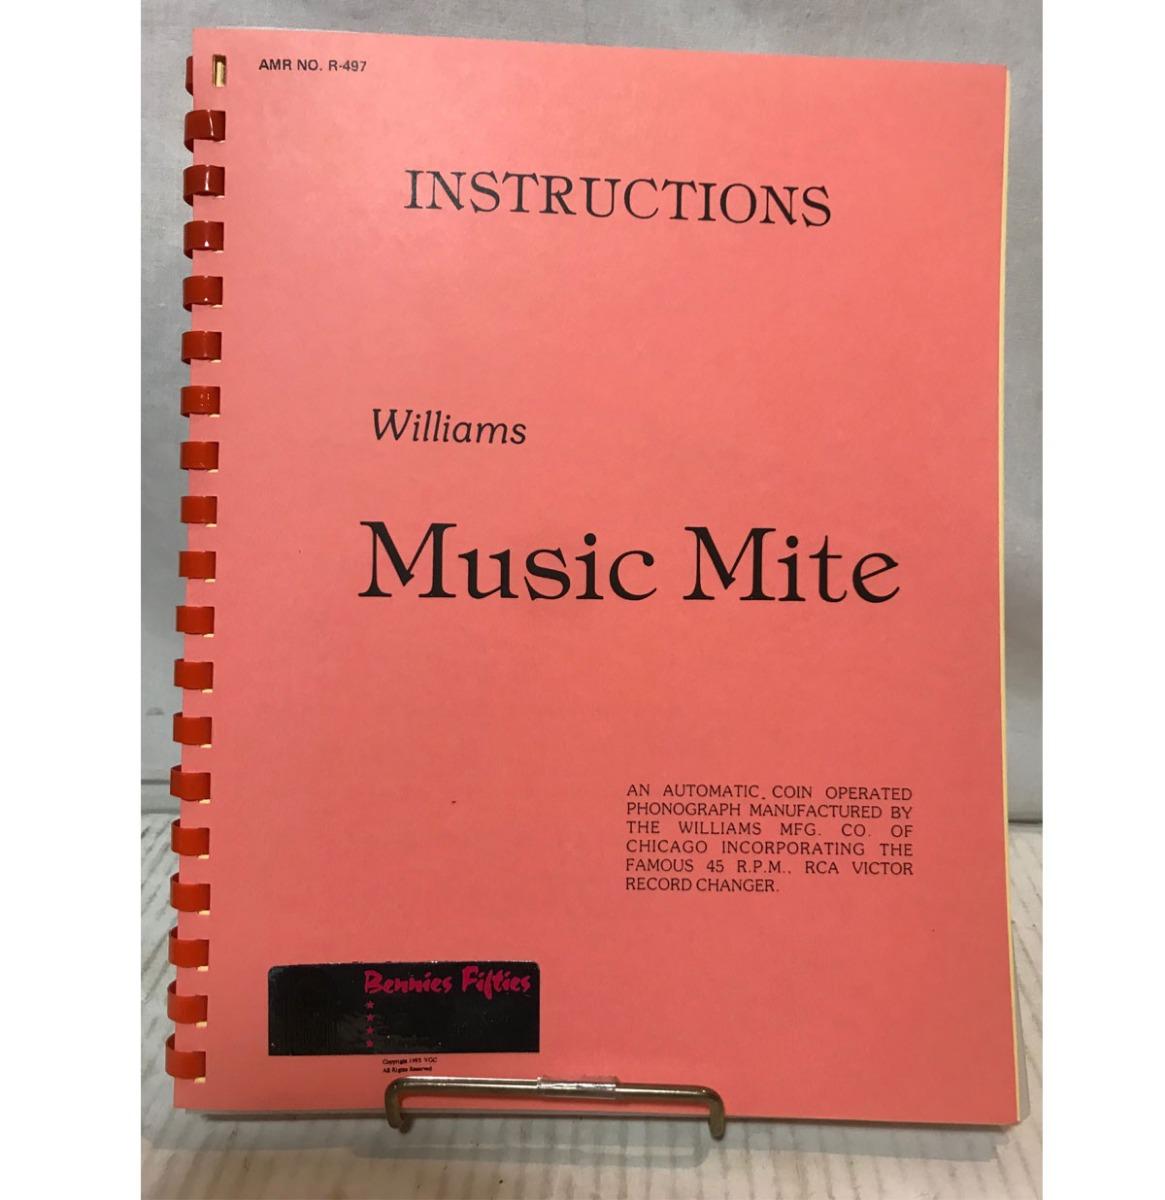 Williams Music Mite Instruction Service Manual